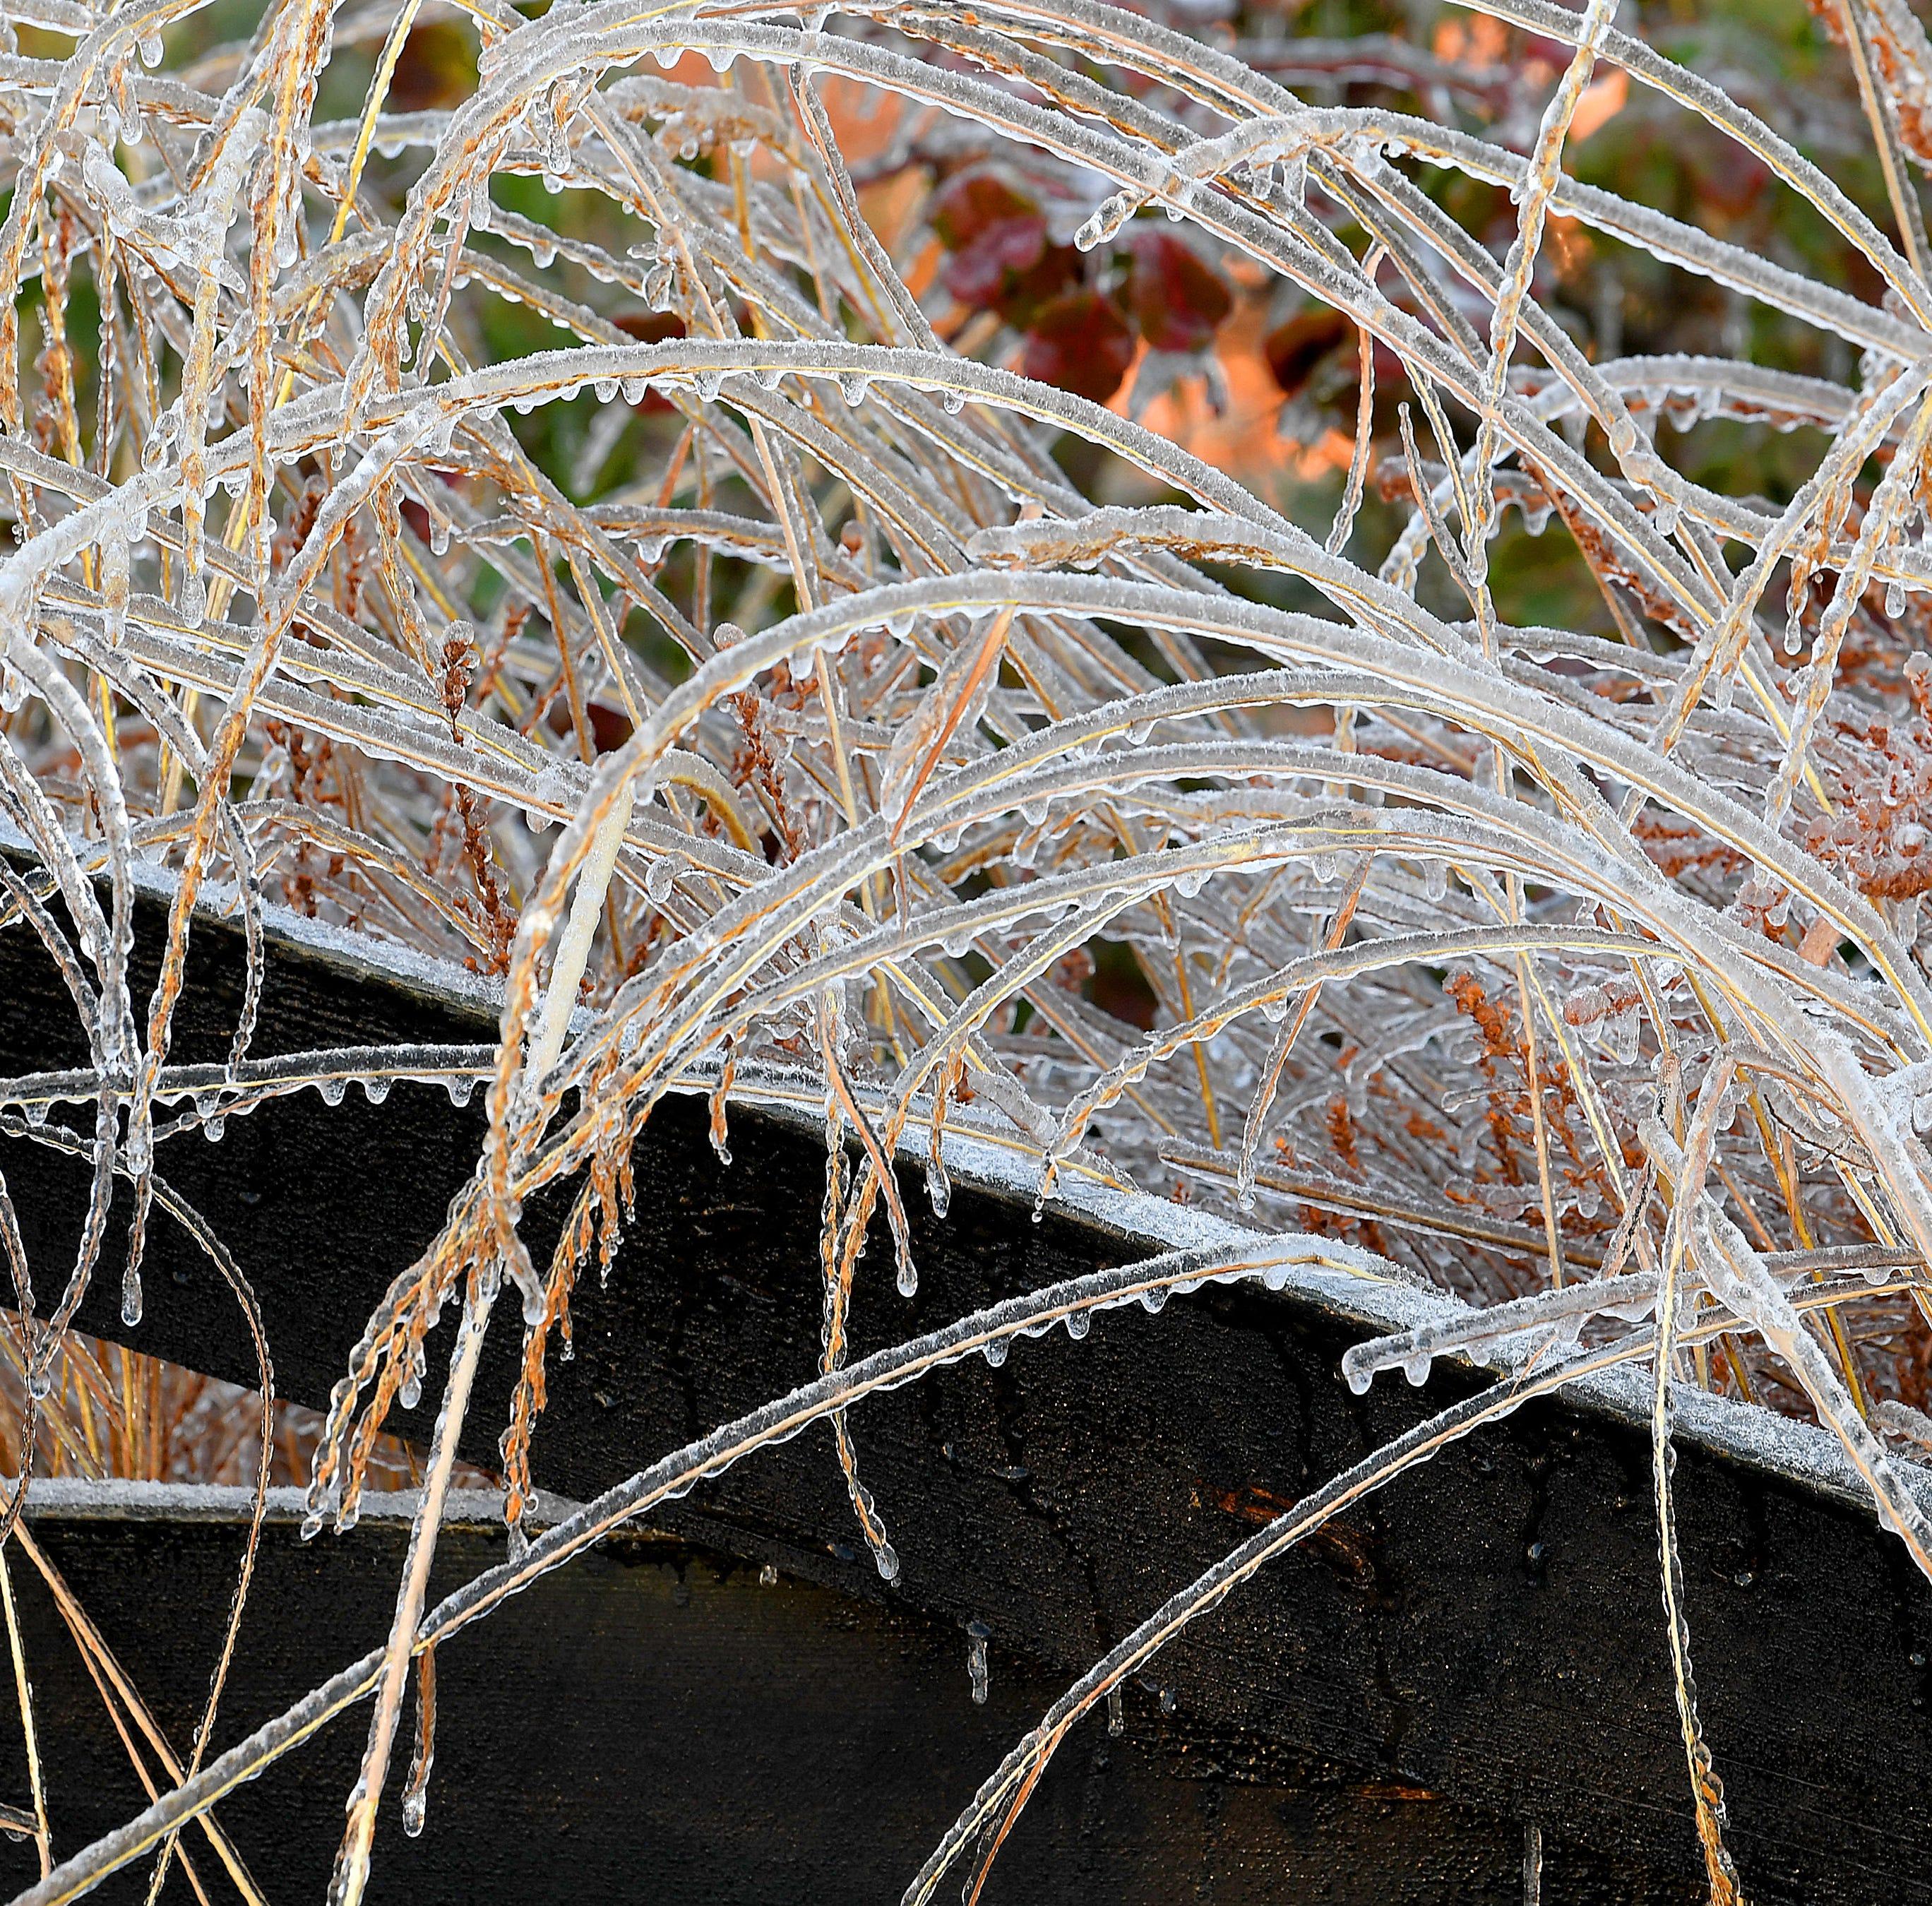 UPDATE: Winter weather advisory for Saturday